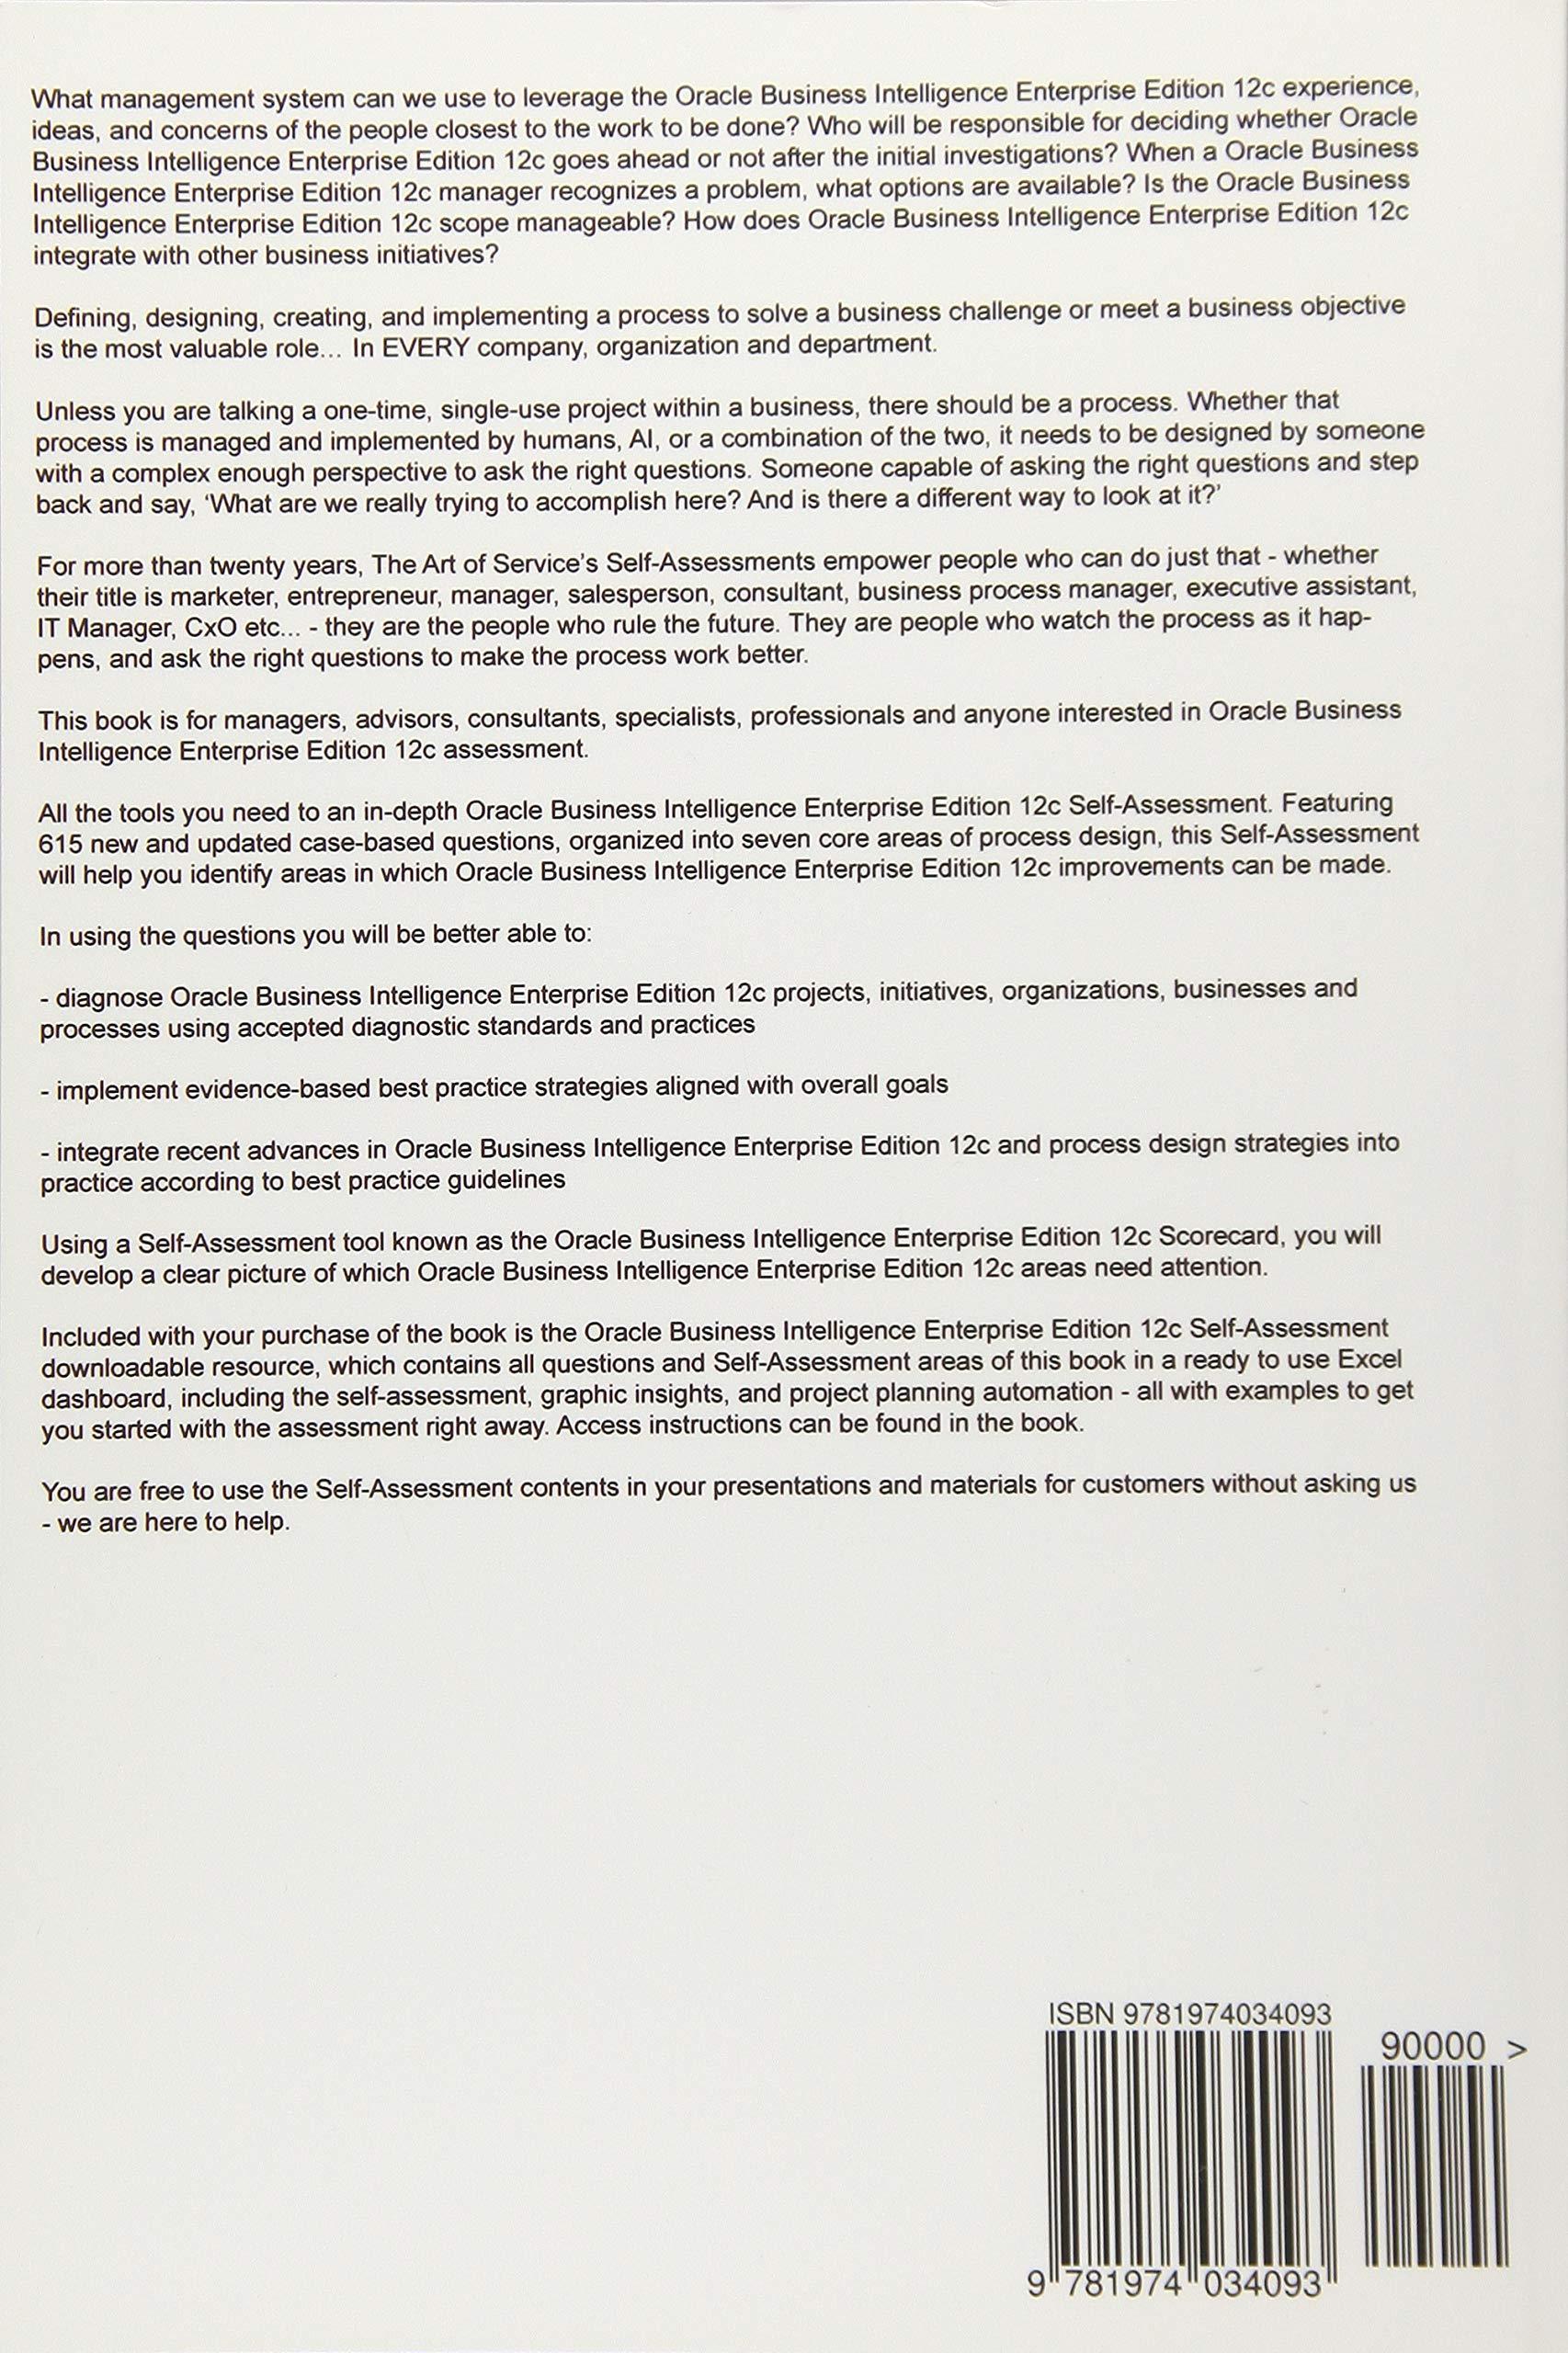 Oracle Business Intelligence Enterprise Edition 12c Complete